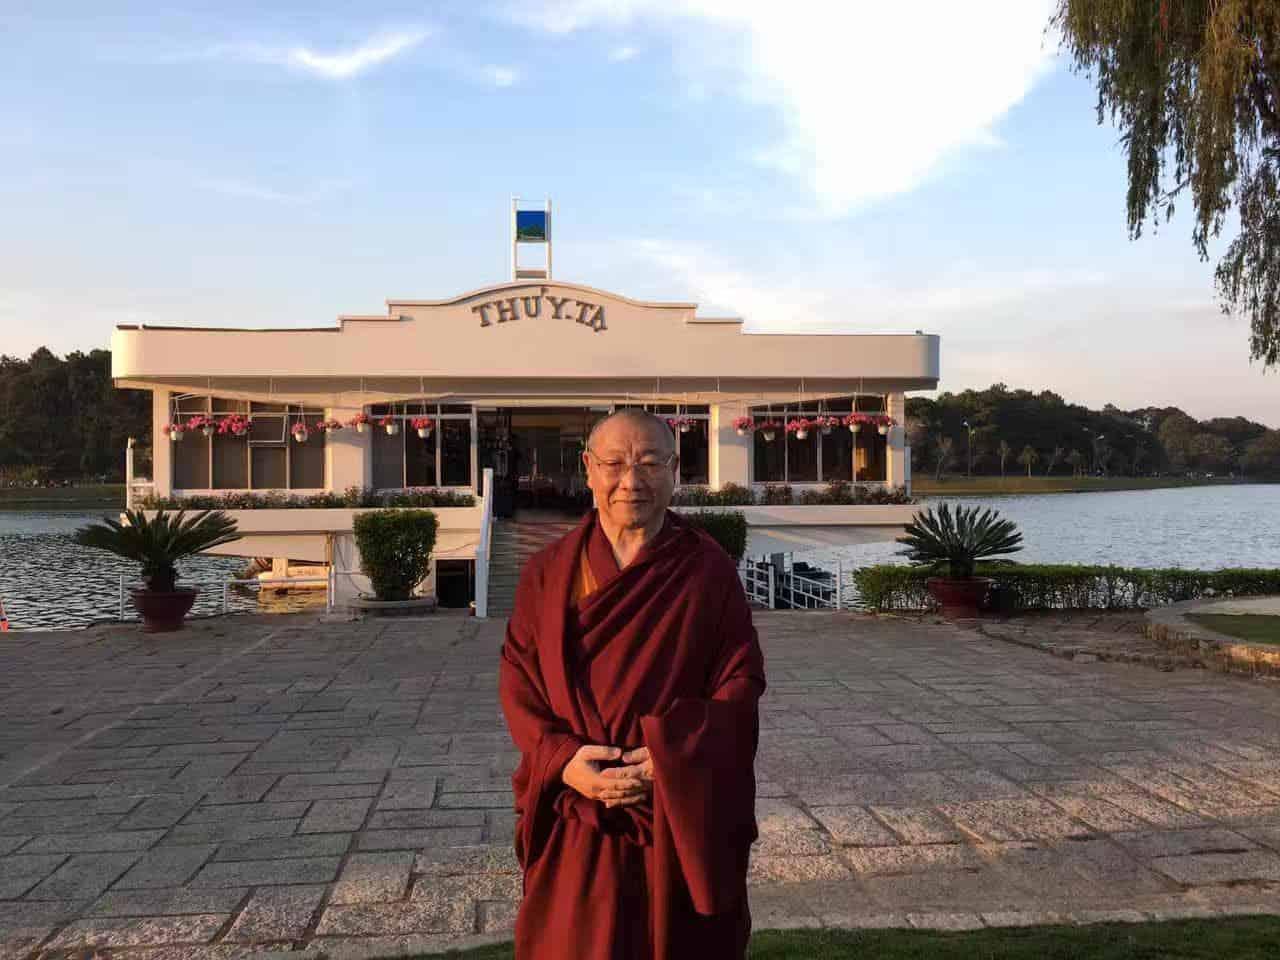 Gosok Rinpoche Vietnam 2017-03-07 6ef59fb4e4590a404ad551bfe753ad9